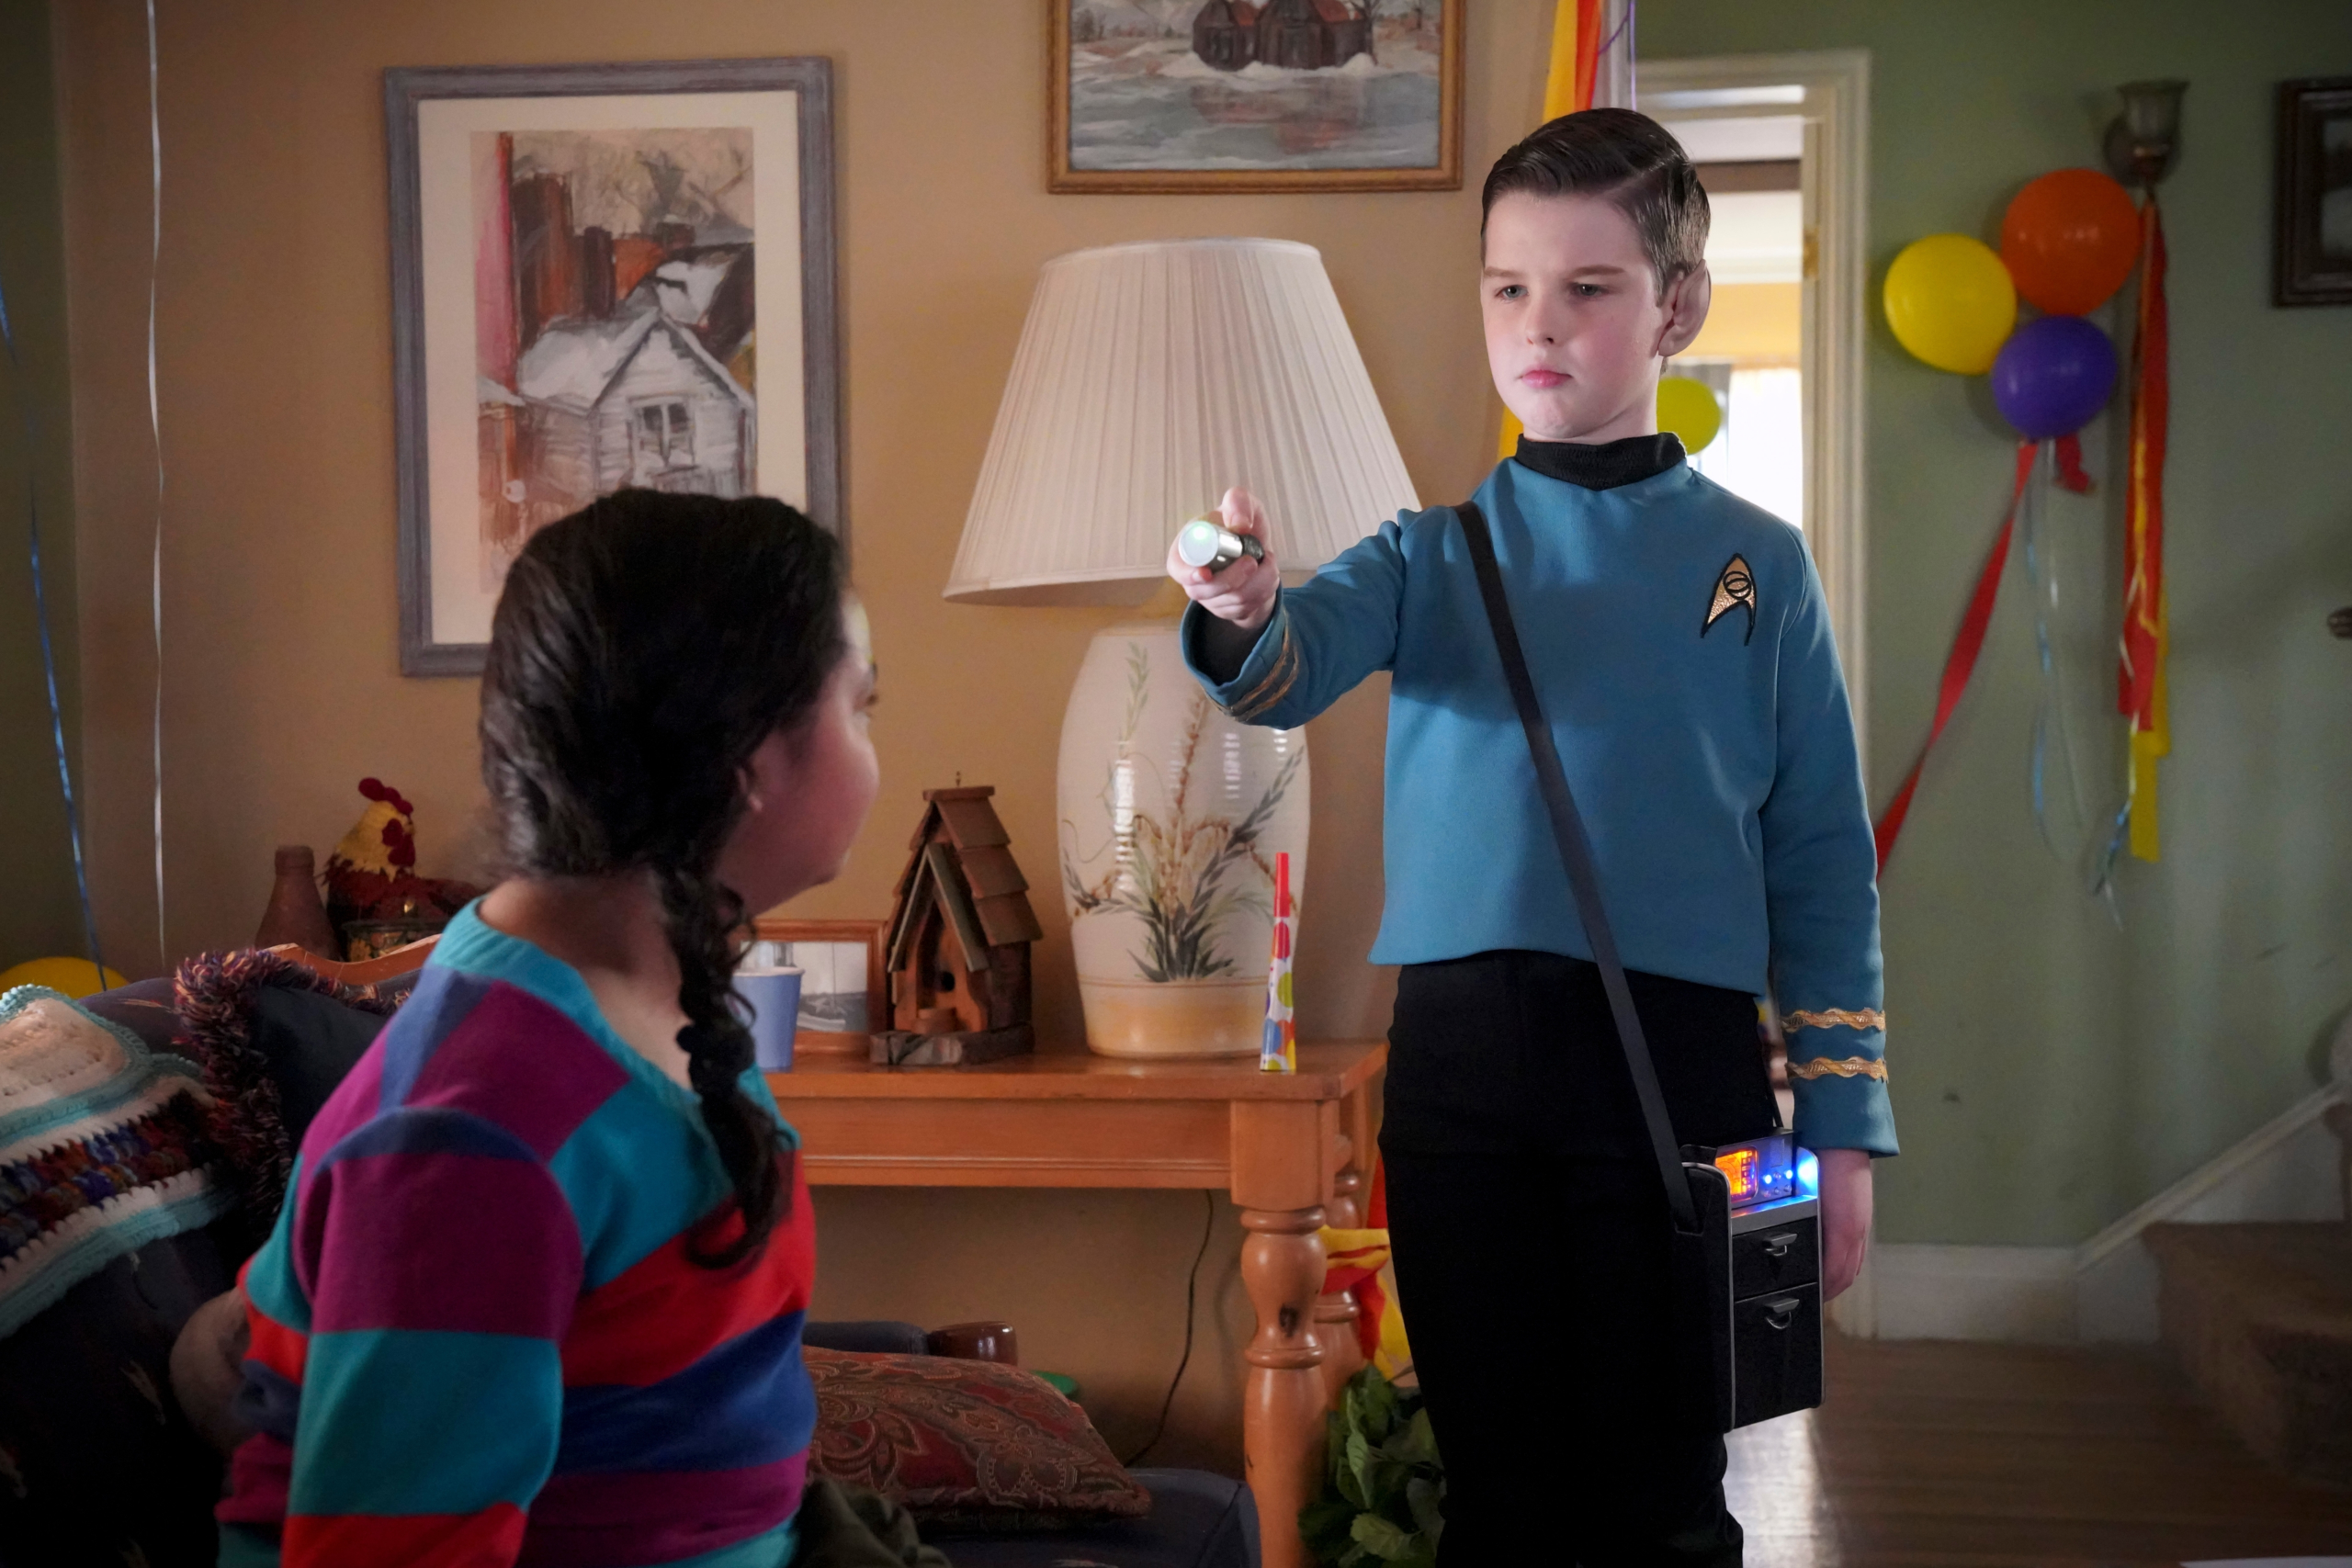 Iain Armitage Sheldon Cooper 2560x1707